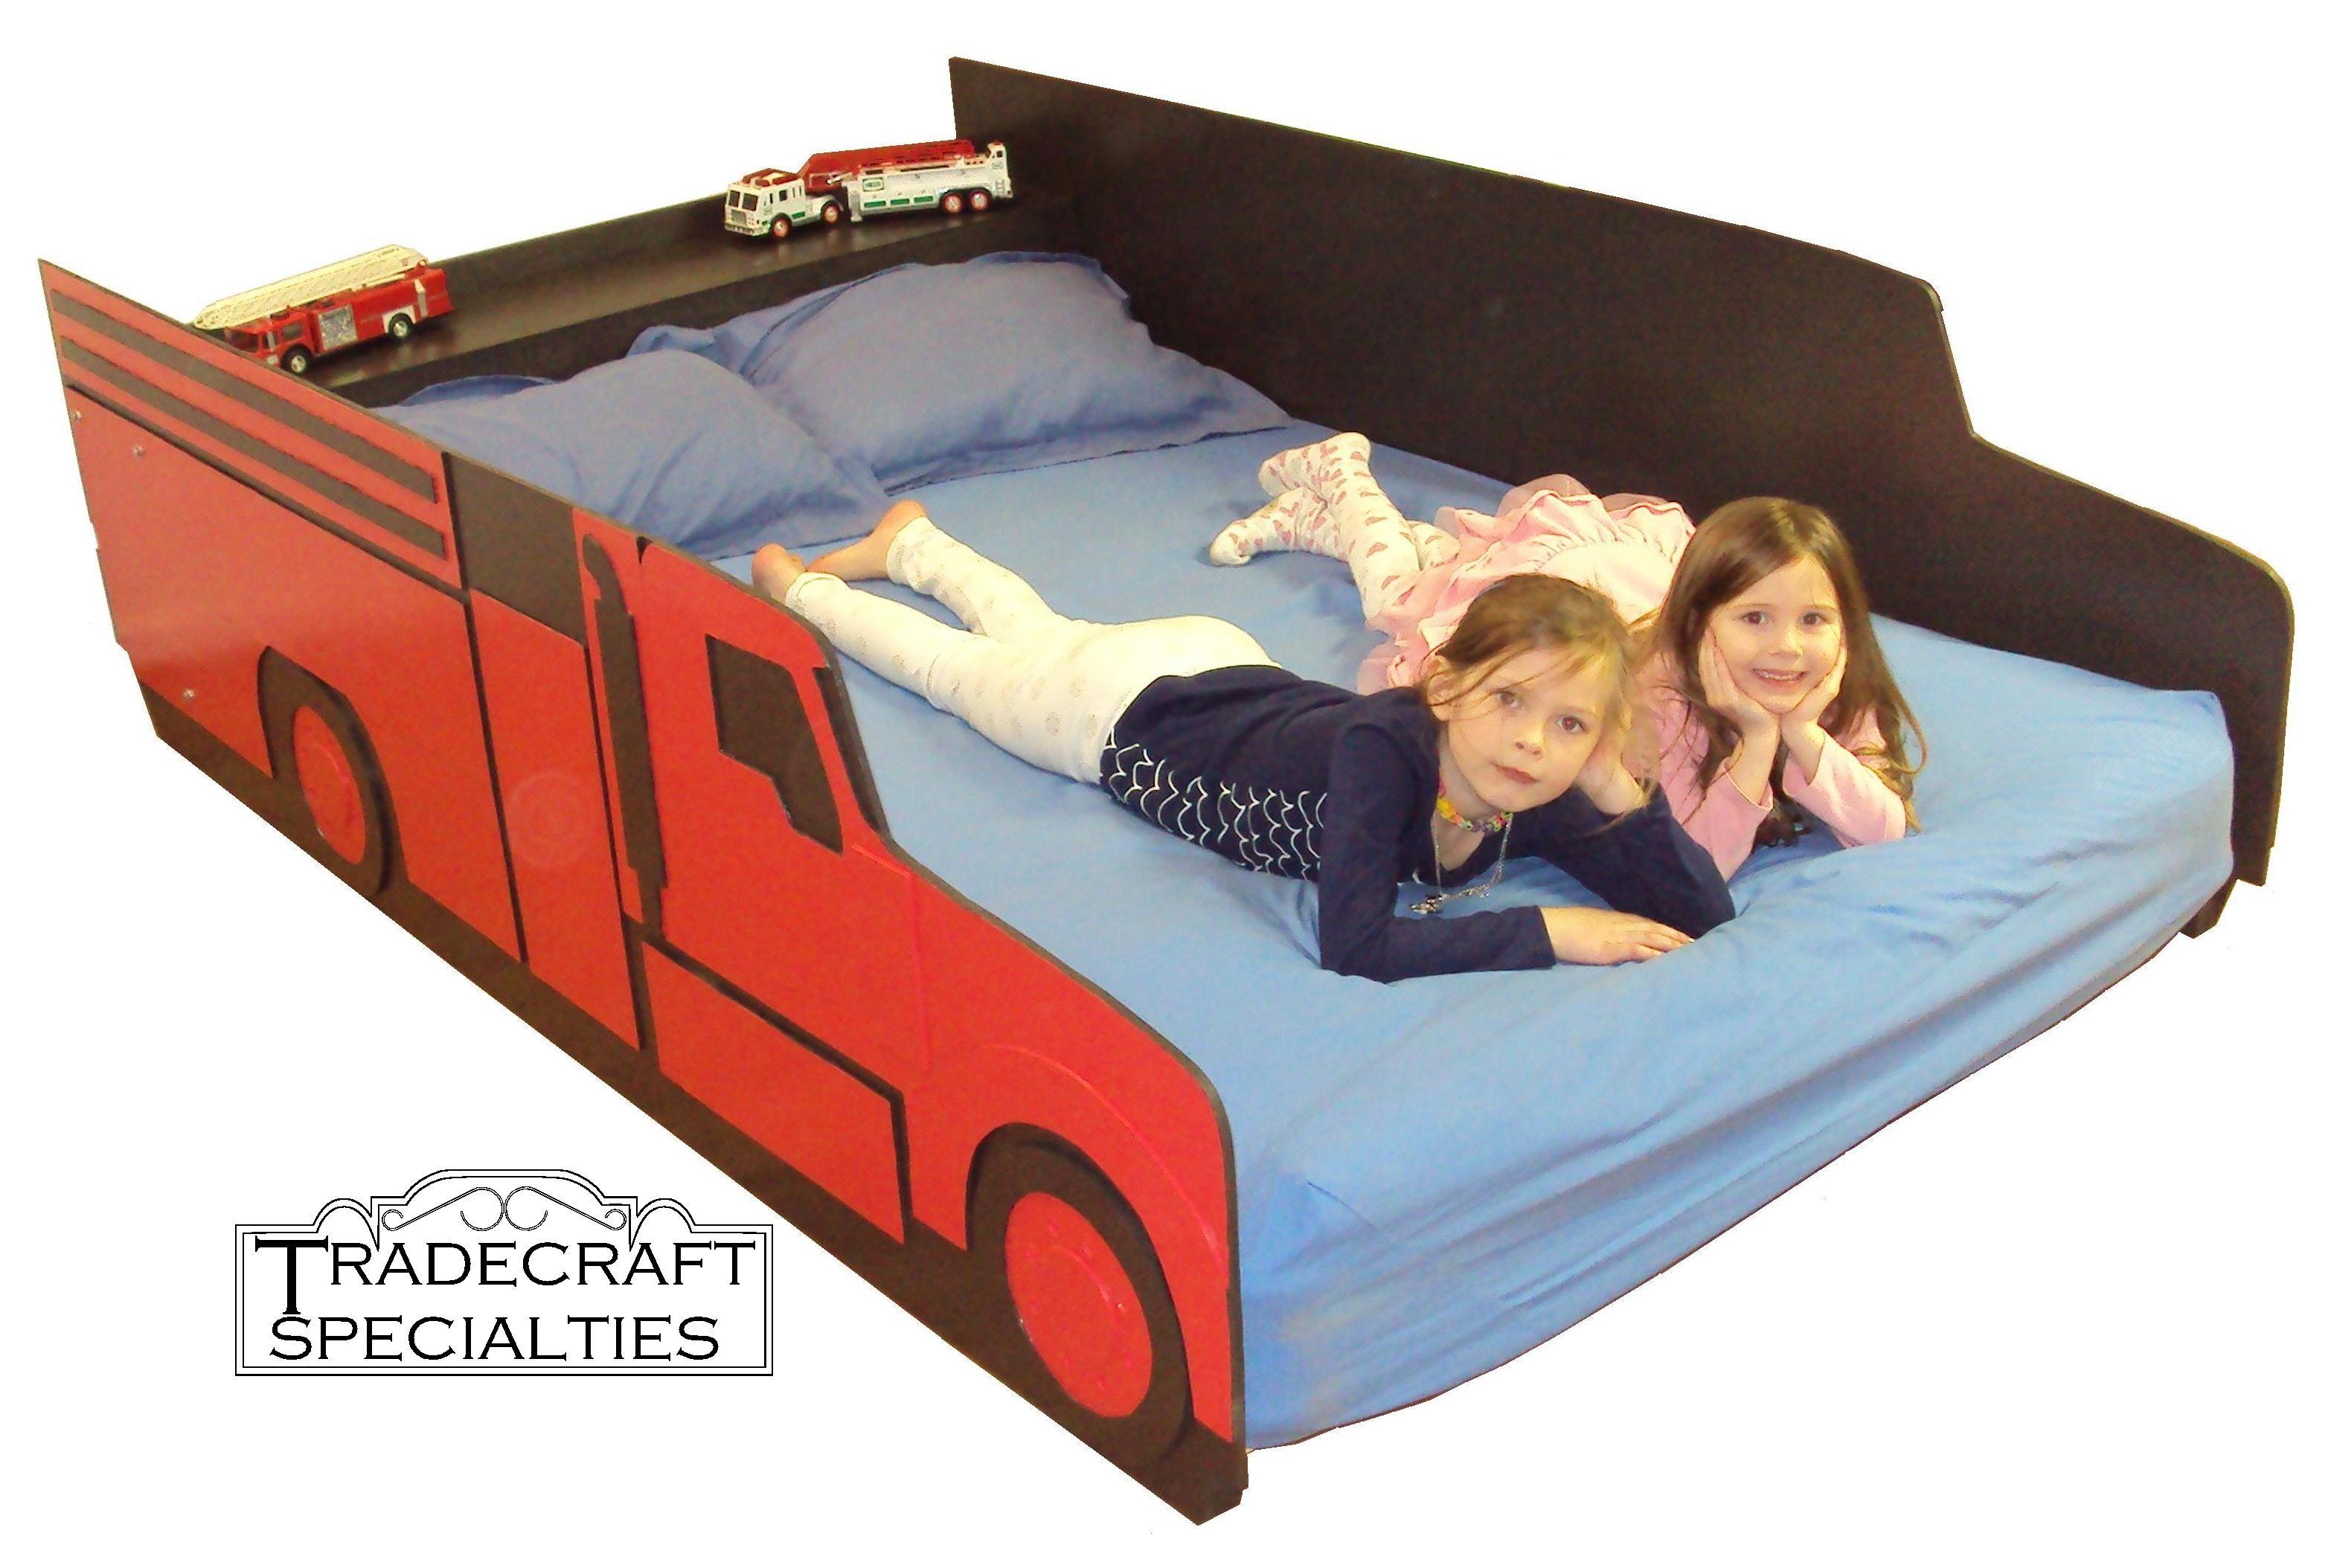 FIre truck full size bed frame Firetruck bed, Full size